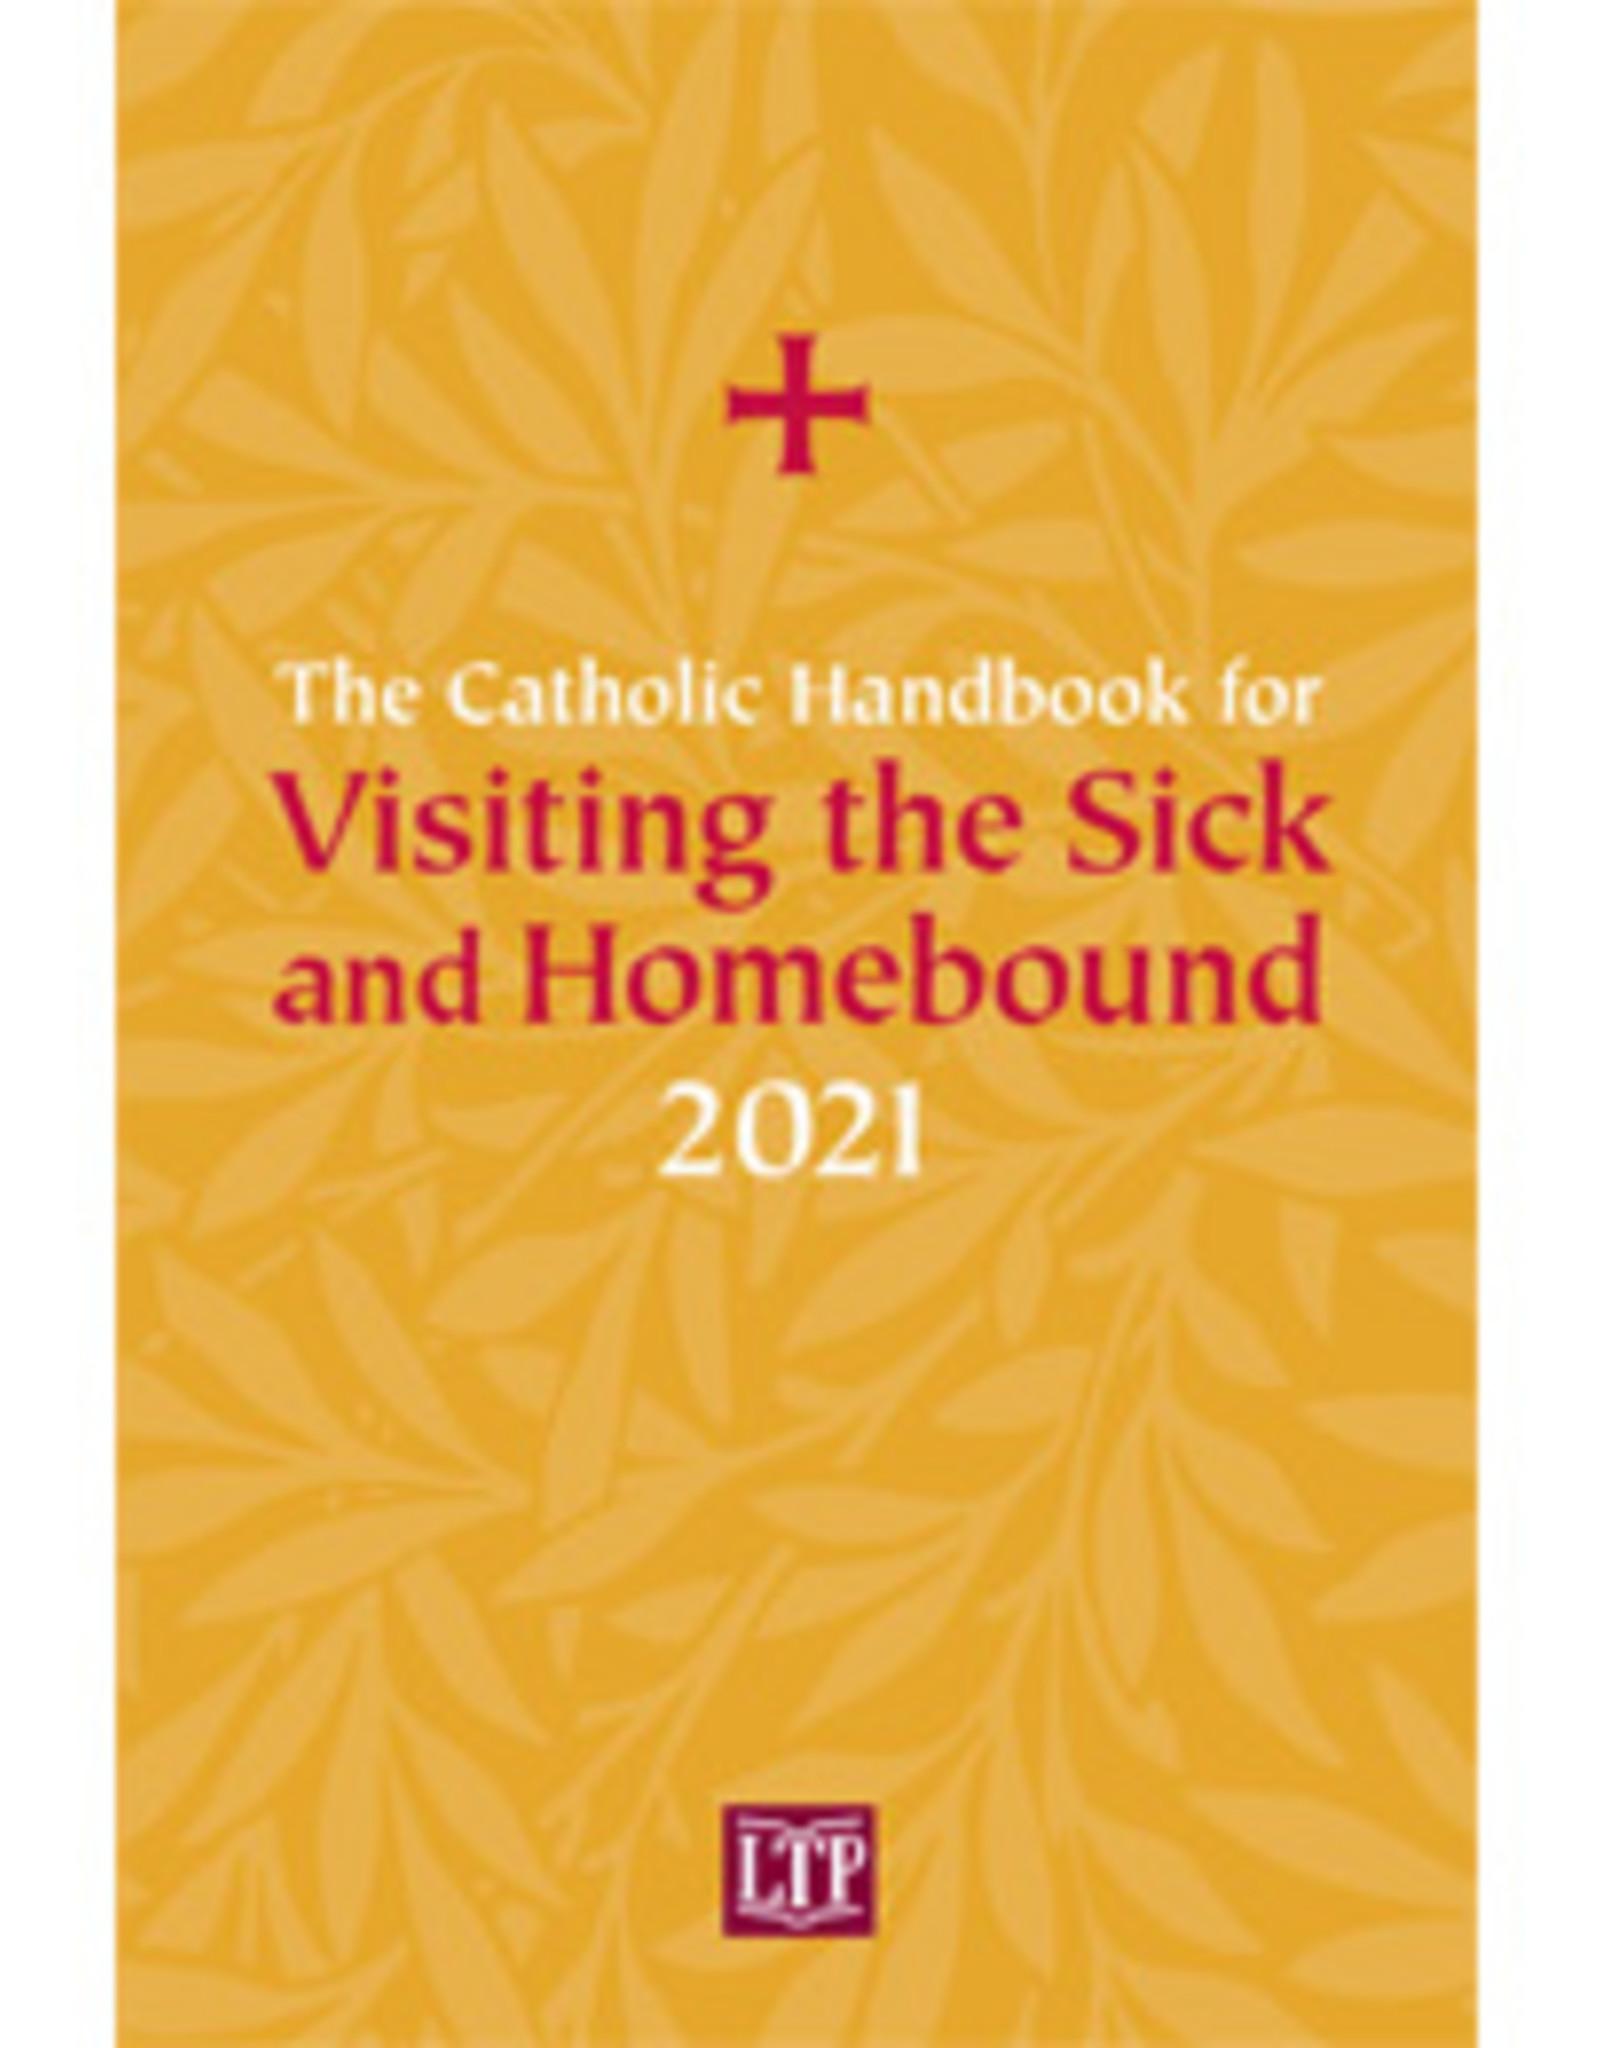 2021 Catholic Handbook for Visiting the Sick & Homebound